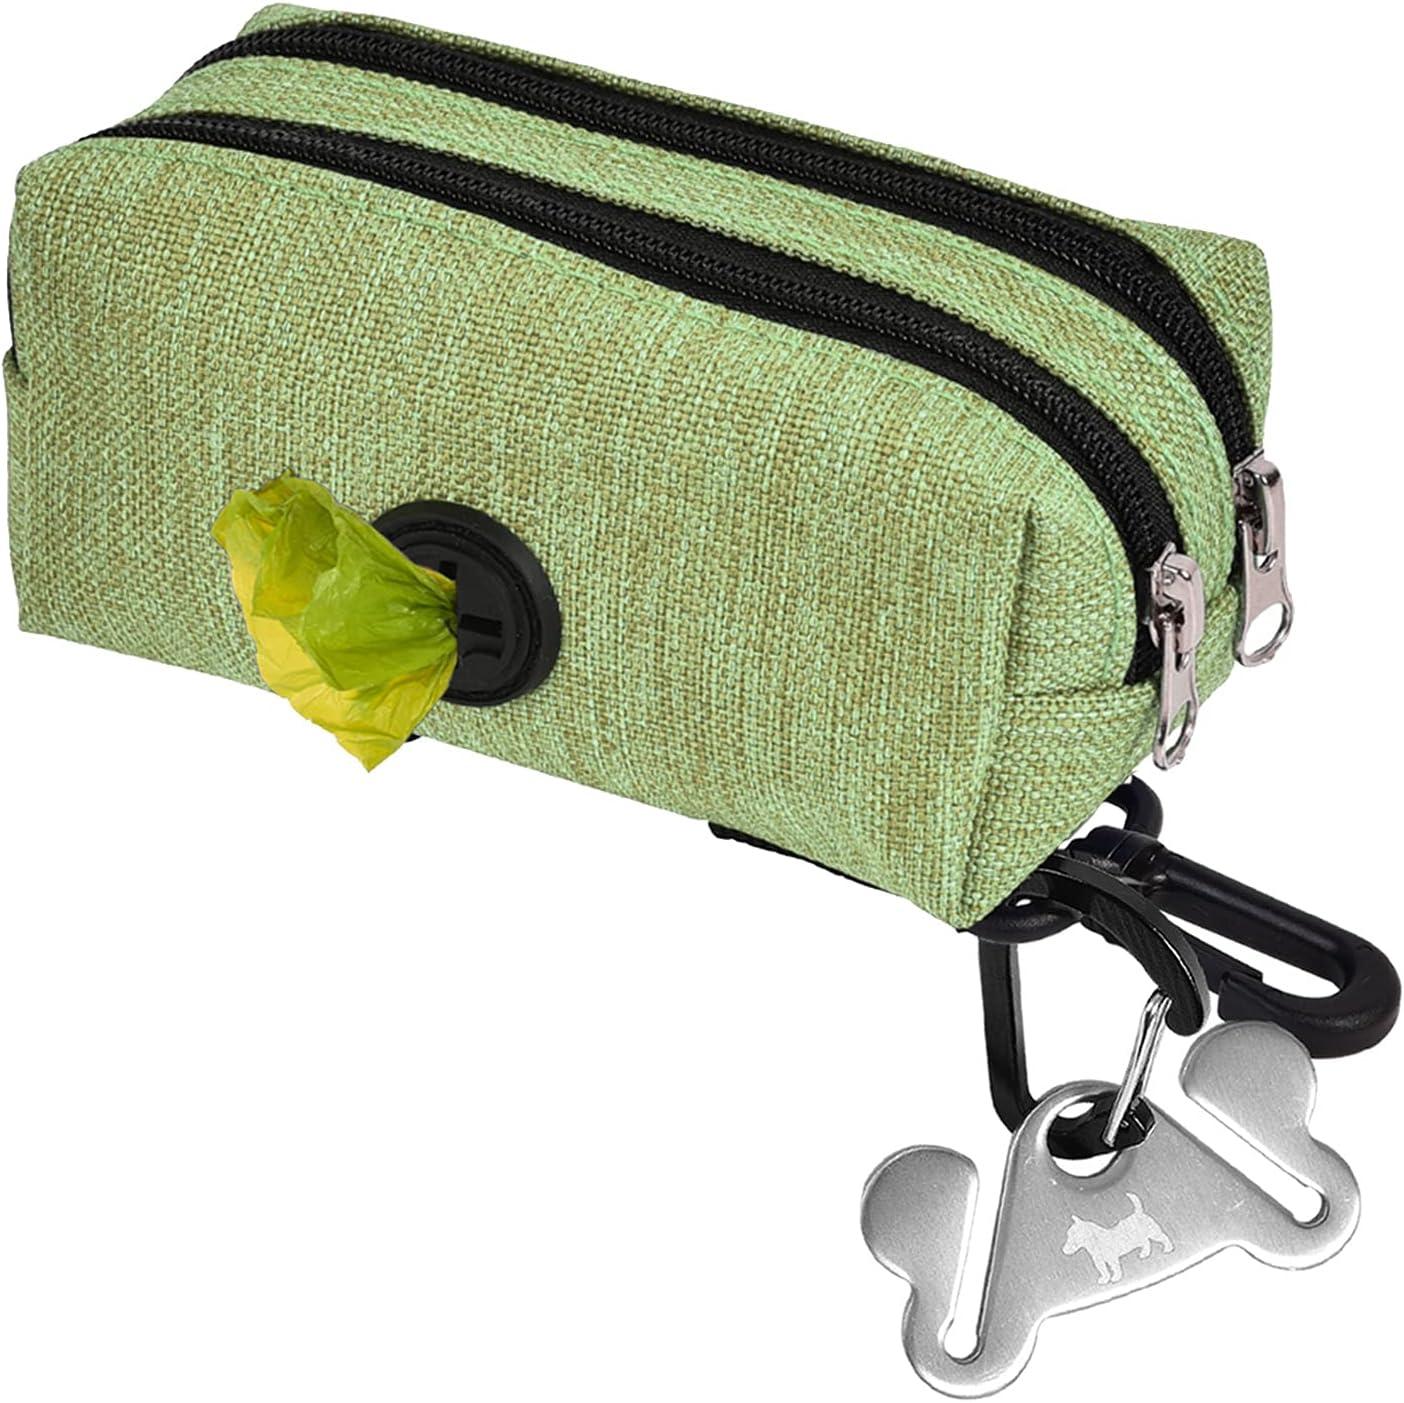 Dog Poop Bag Finally popular brand Sale Special Price Dispenser for Leash Holder - f Attachment Waste